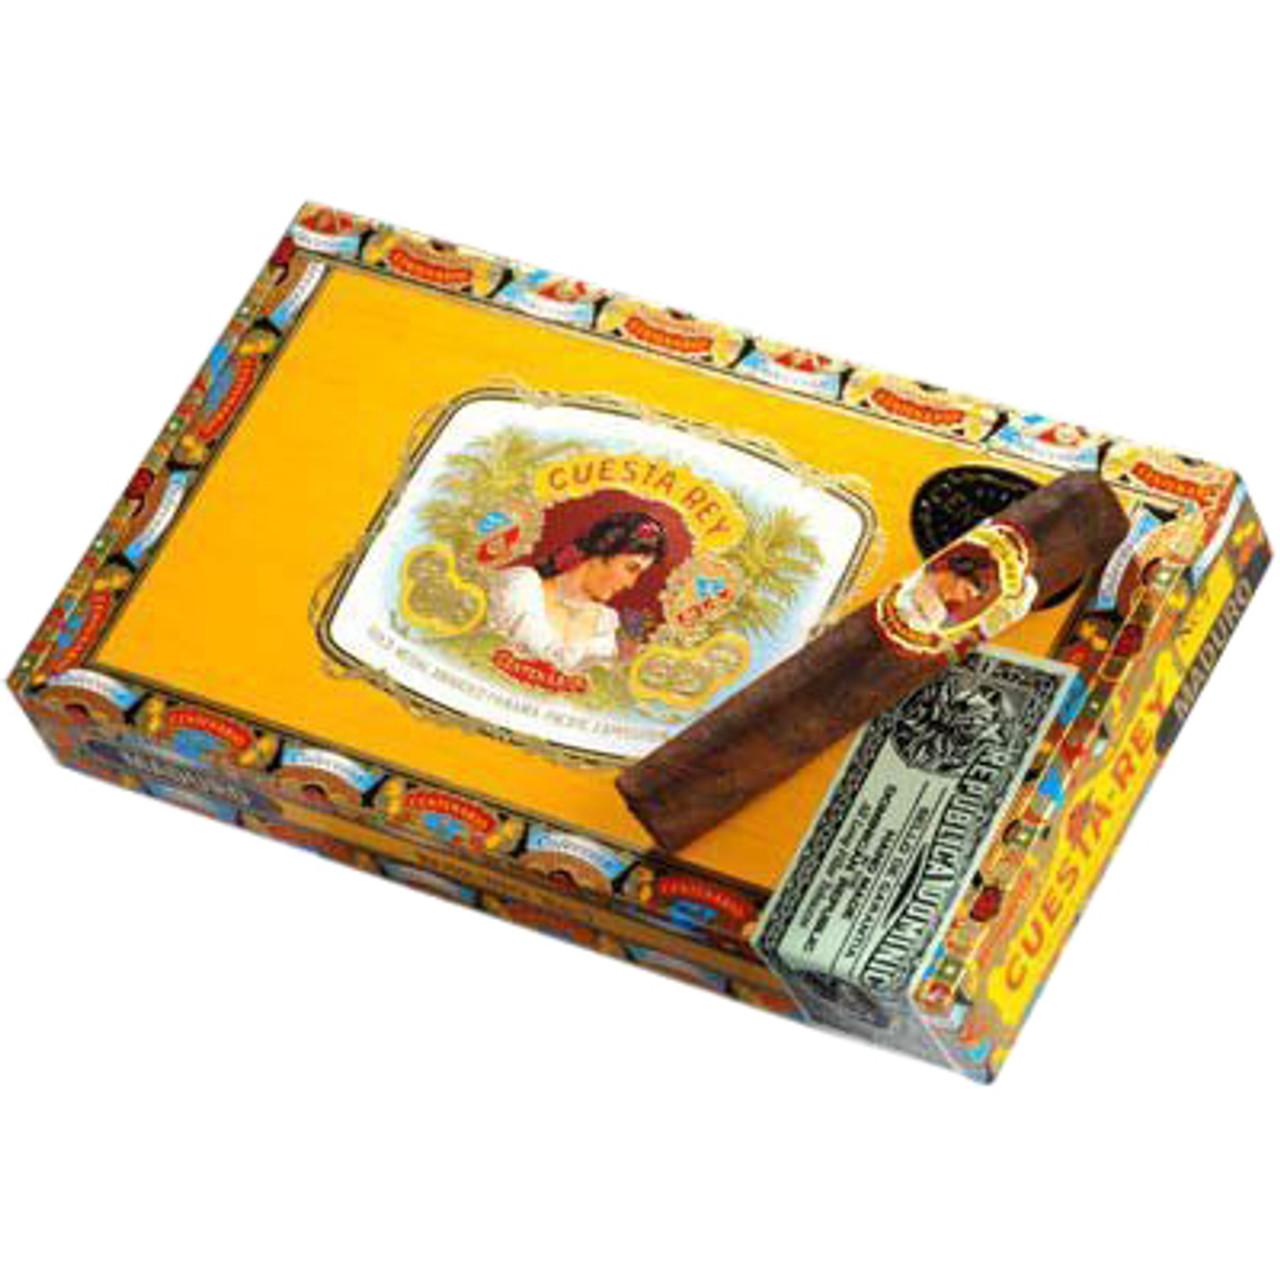 Cuesta Rey No. 7 Centennial Maduro Cigars - 4 1/2 x 50 (Box of 10)